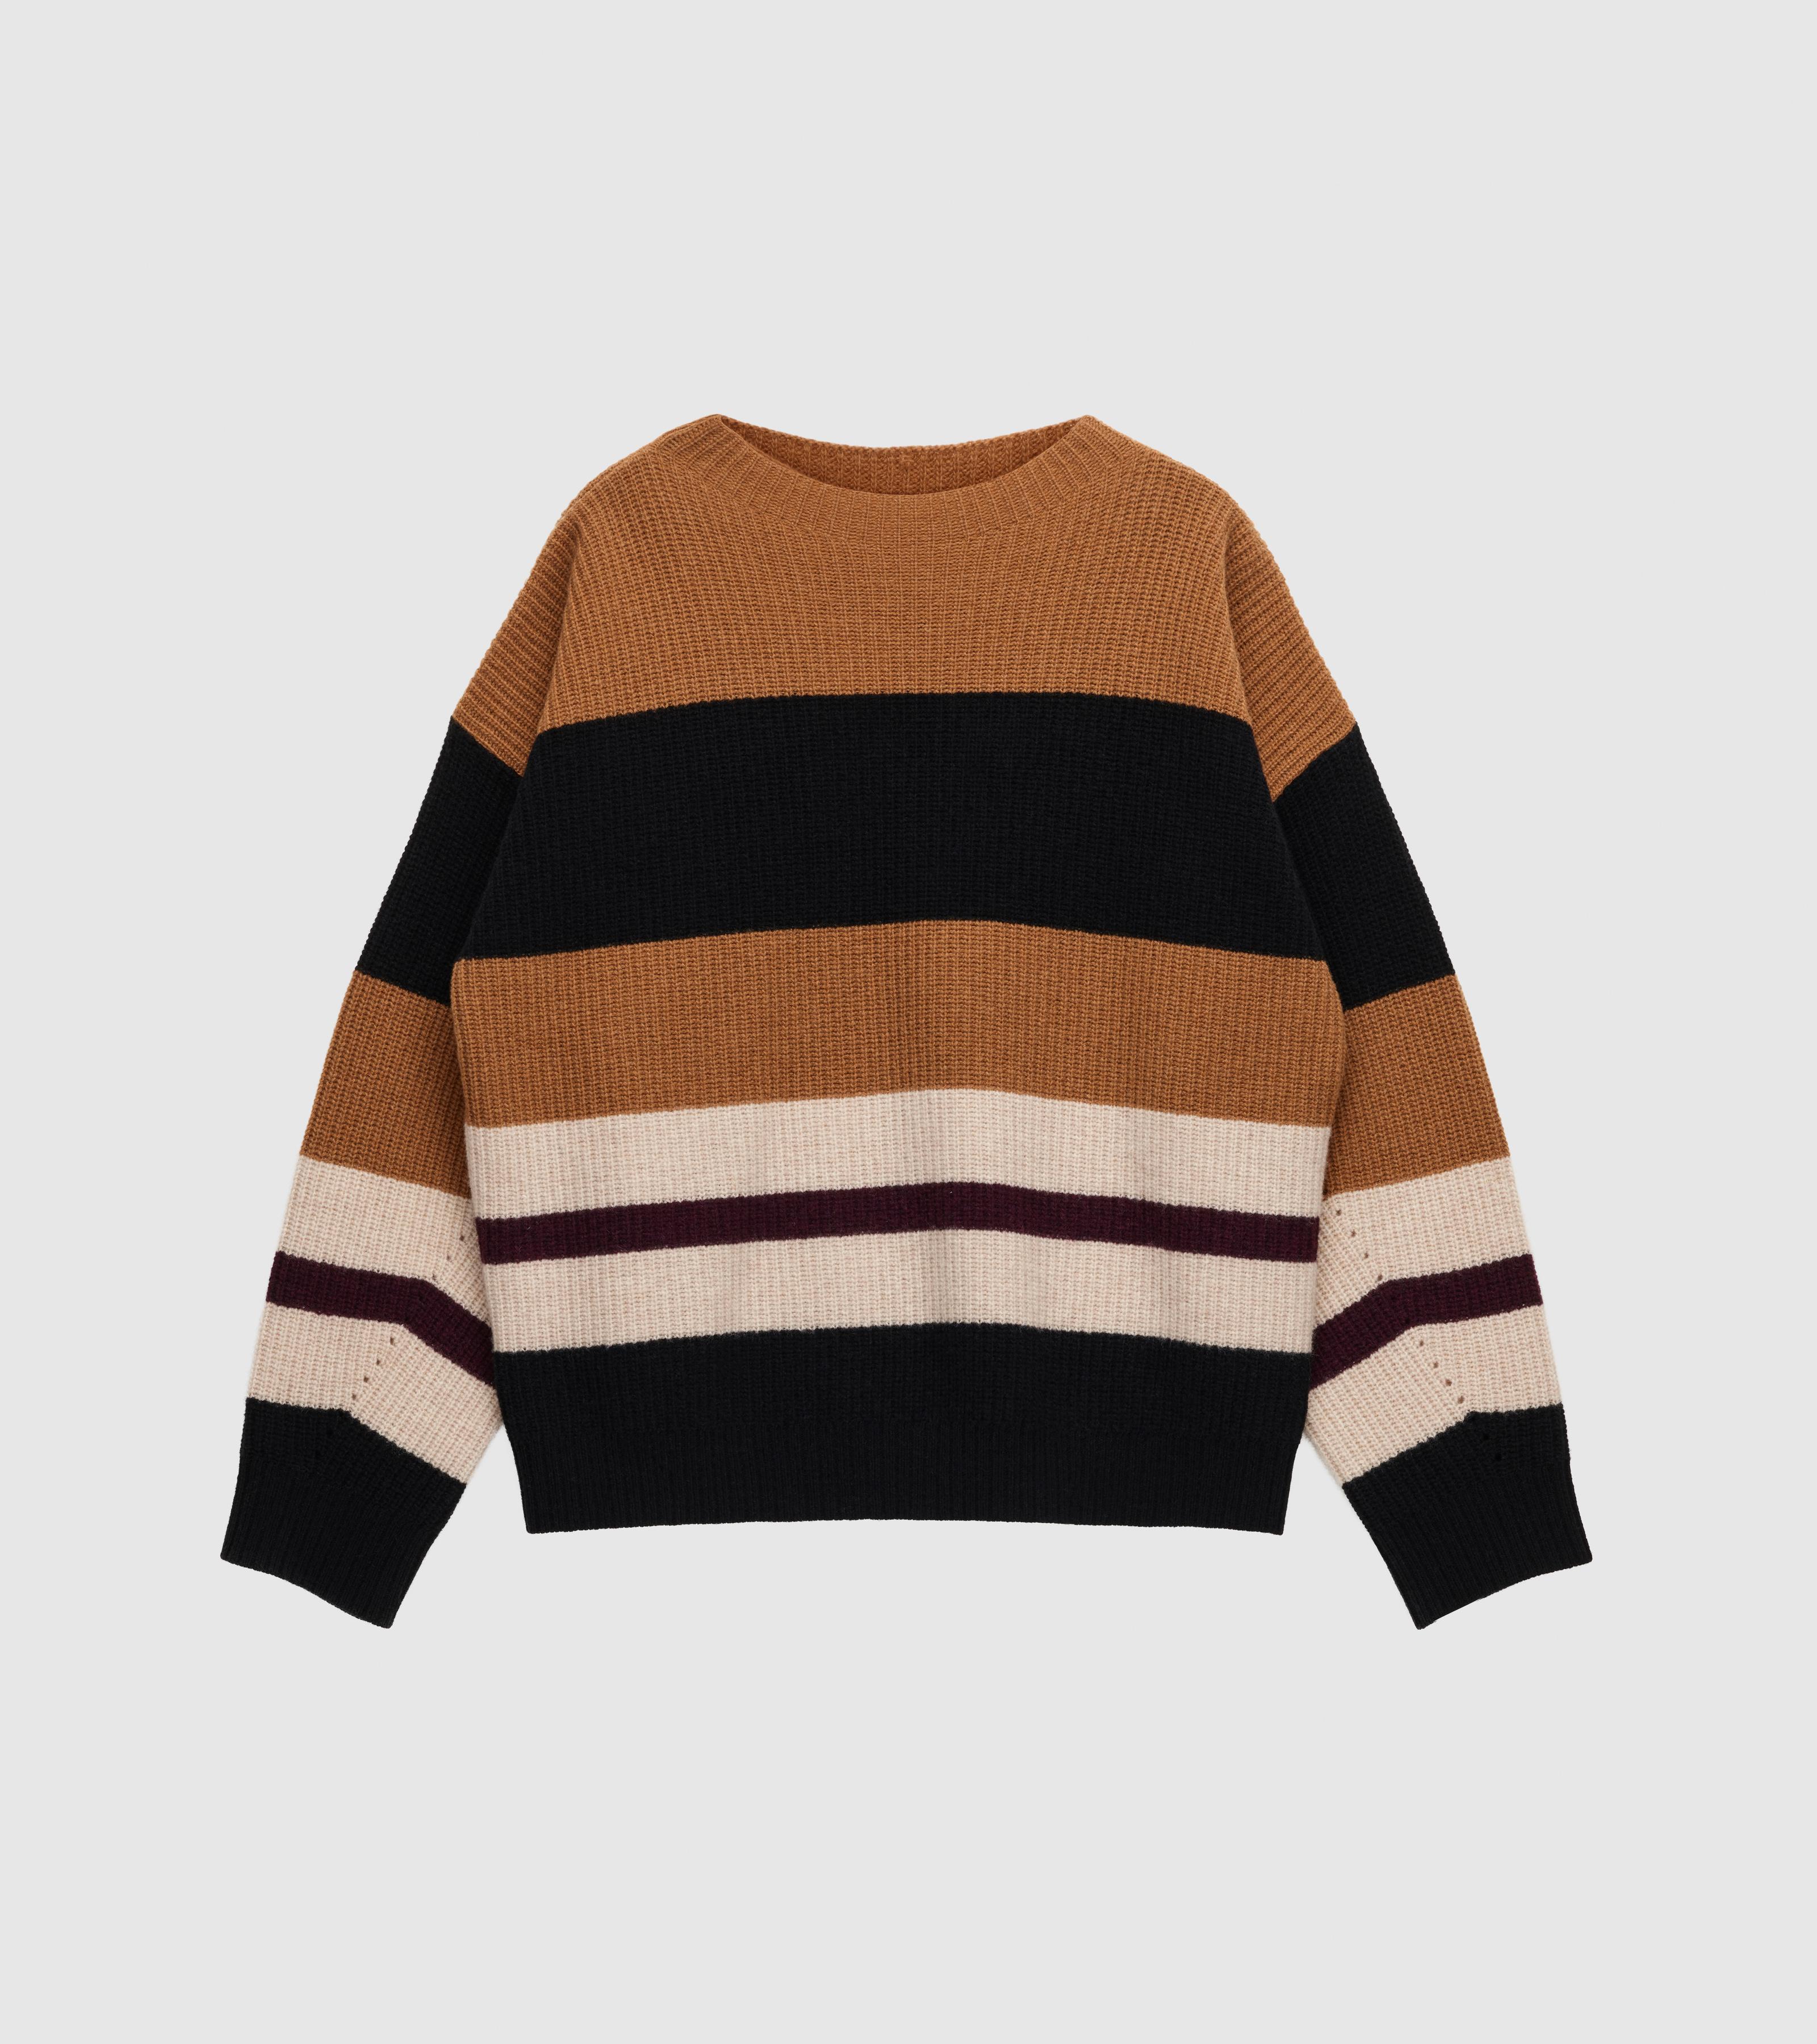 Kara Oversized Sweater Knitted Stripes